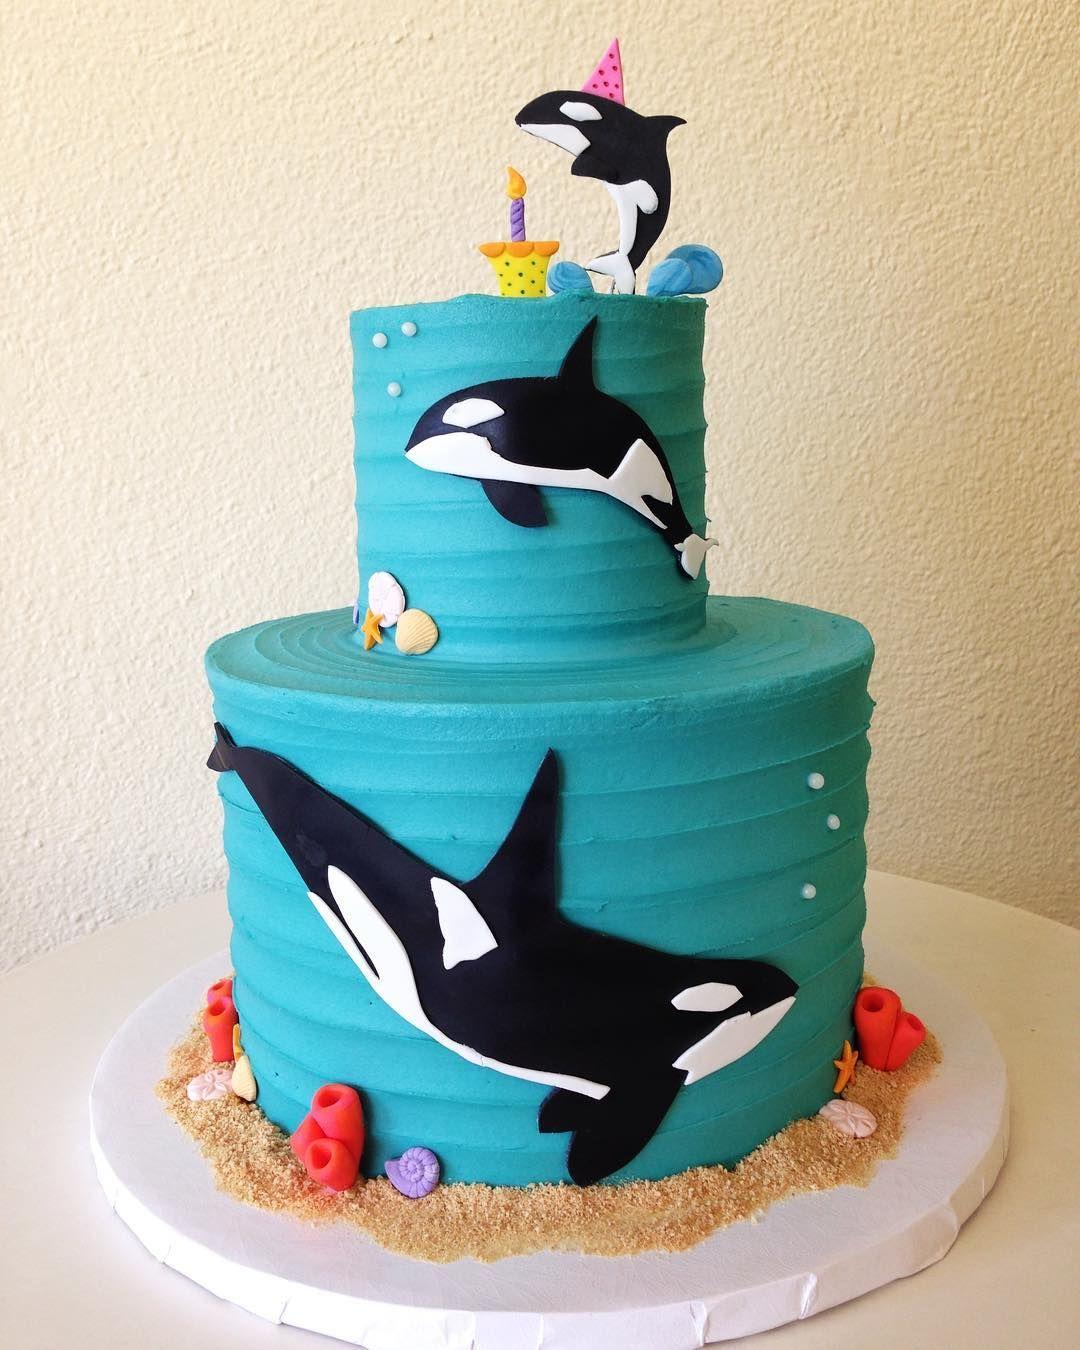 Salmon Birthday Cake: Party Planning